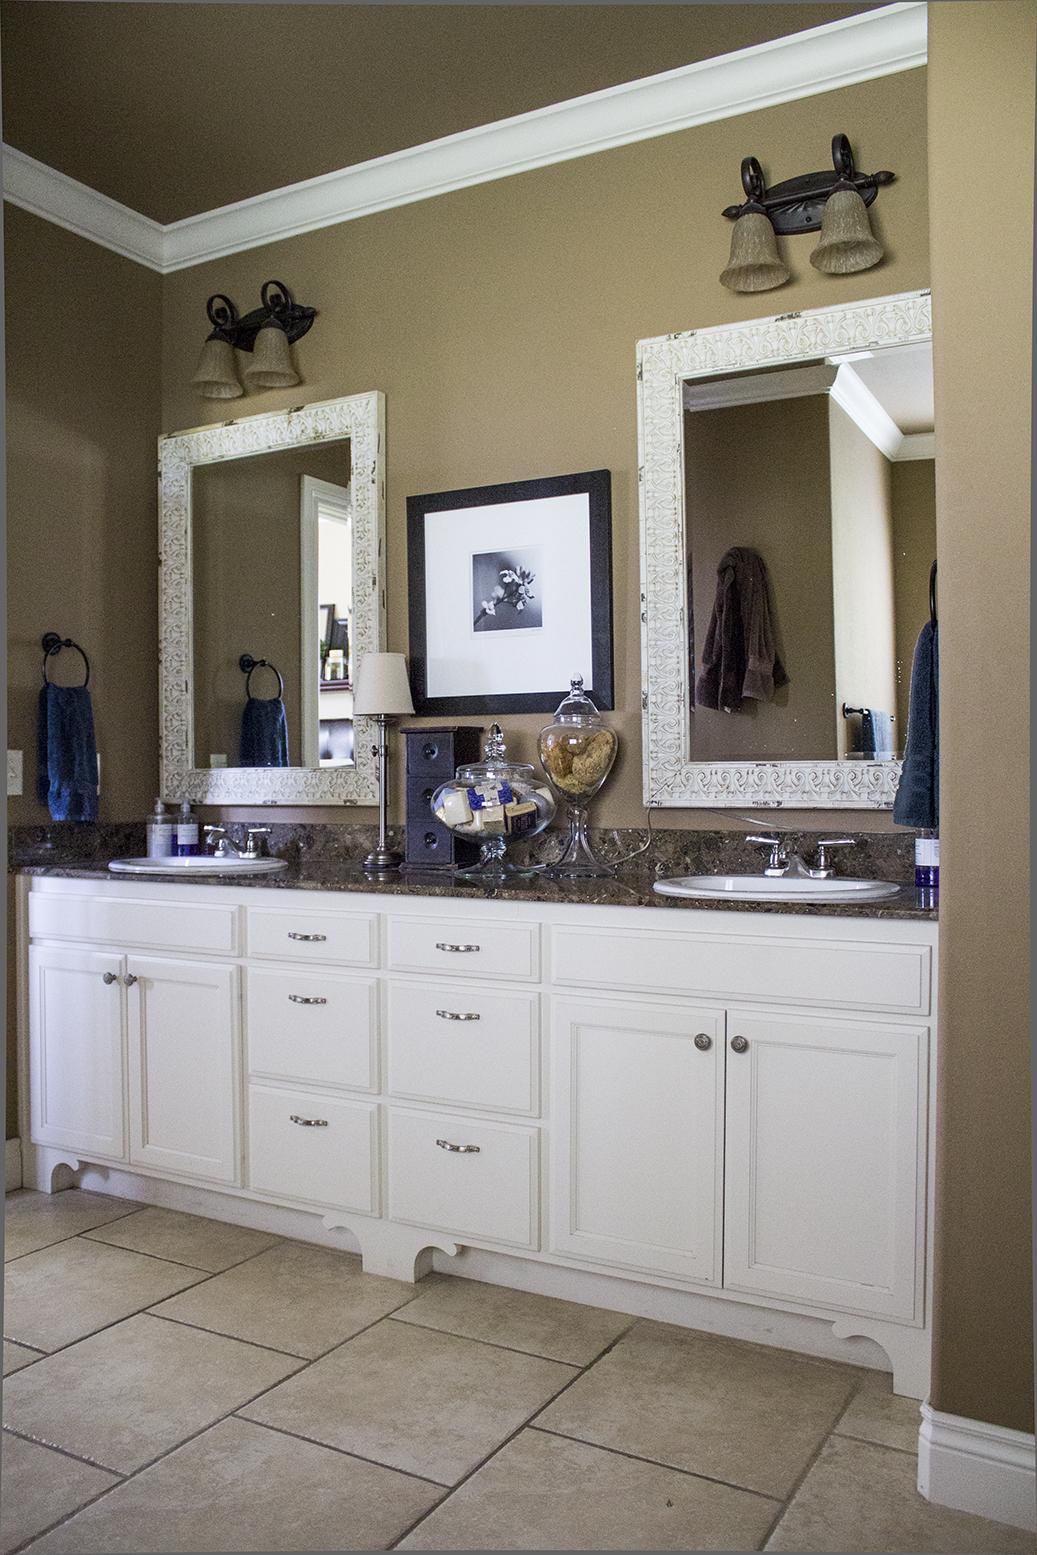 My current master bath vanity.